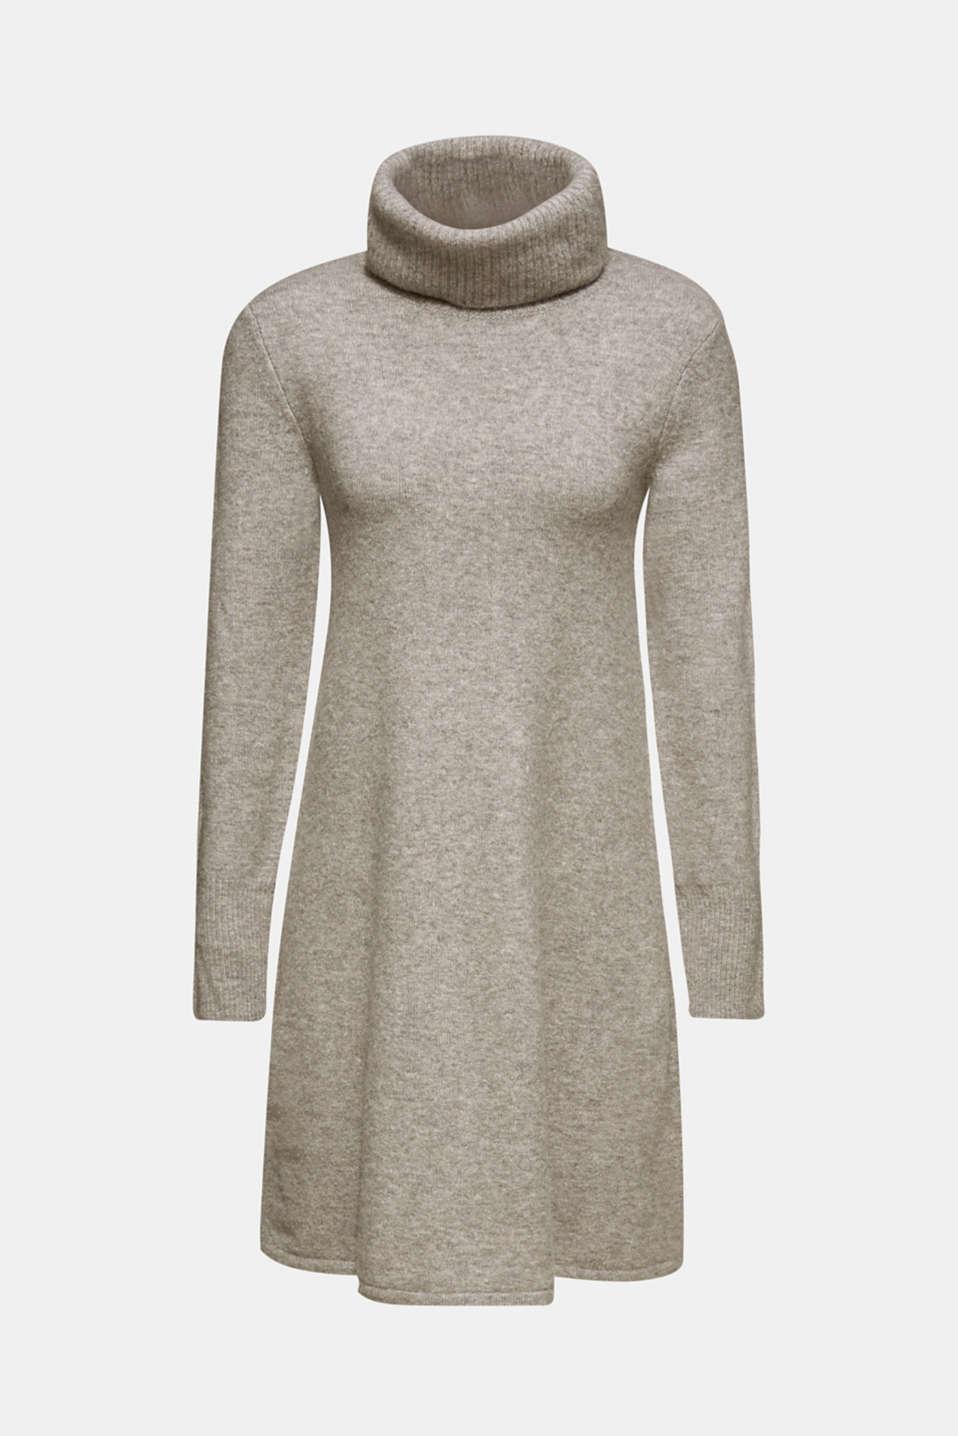 Dresses flat knitted, MEDIUM GREY 5, detail image number 6